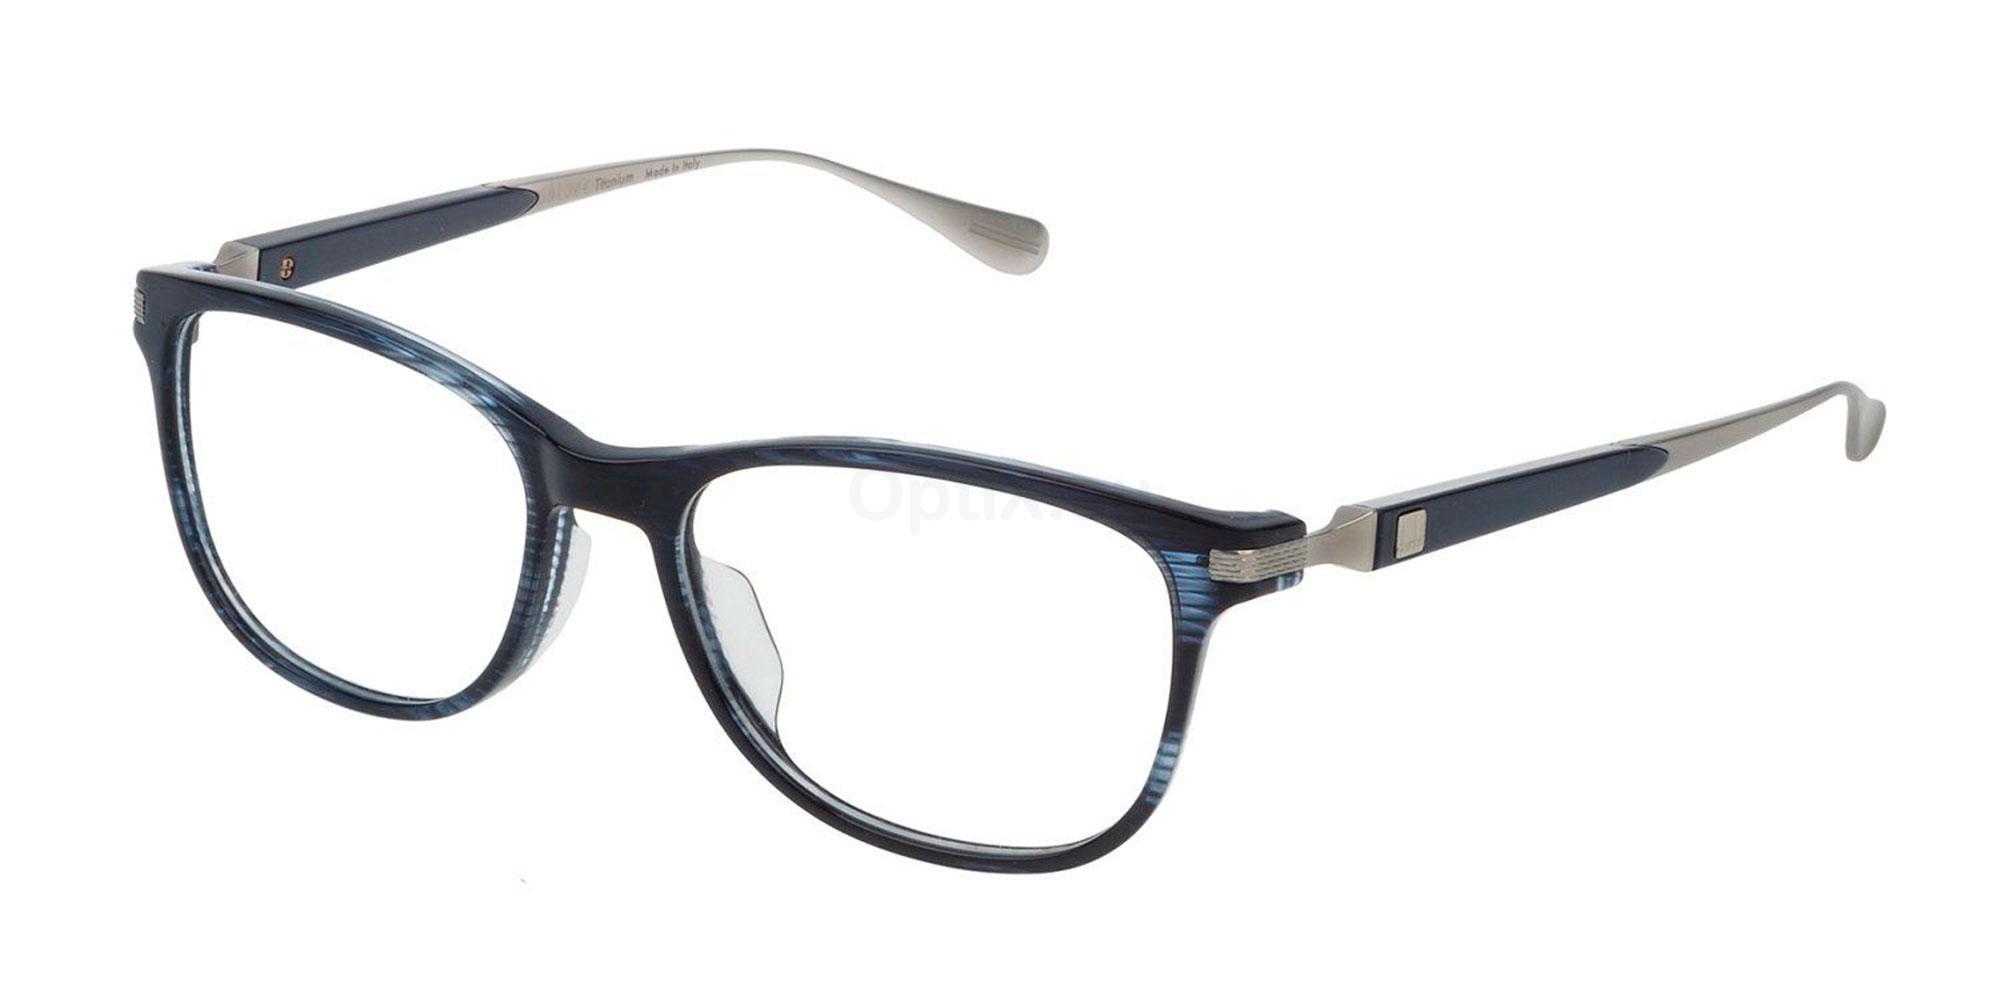 06WR VDH111G Glasses, Dunhill London